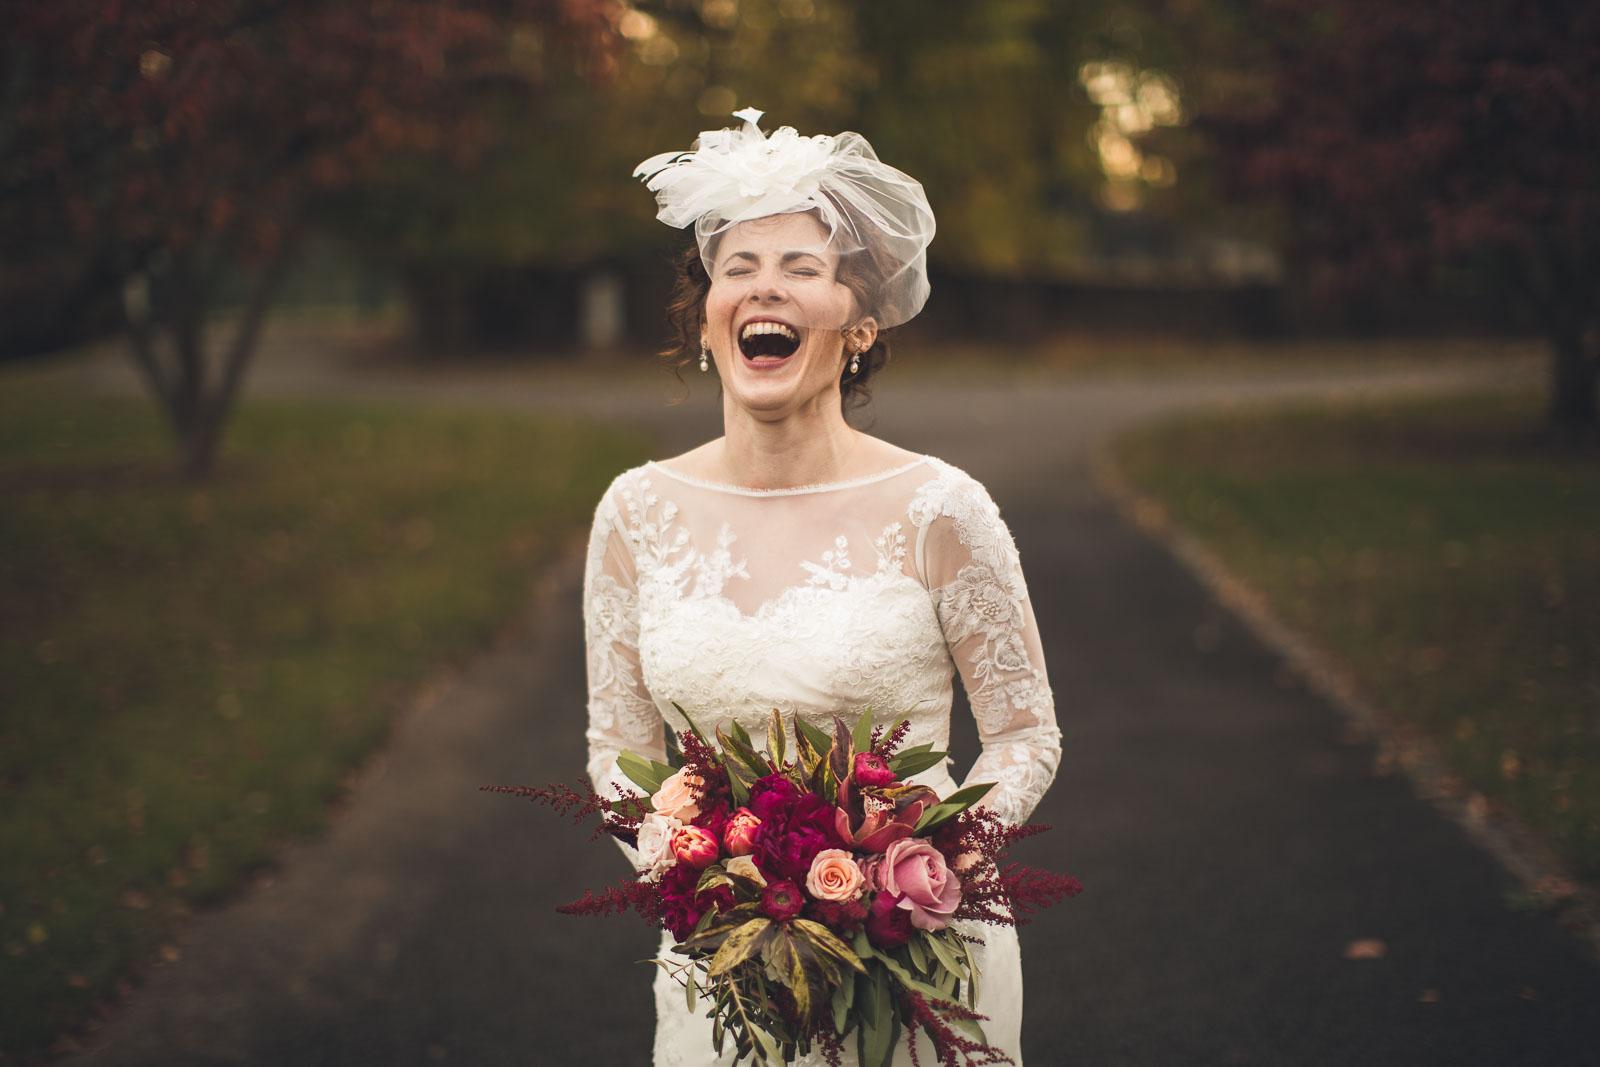 Bride Wedding Portrait New Jersey